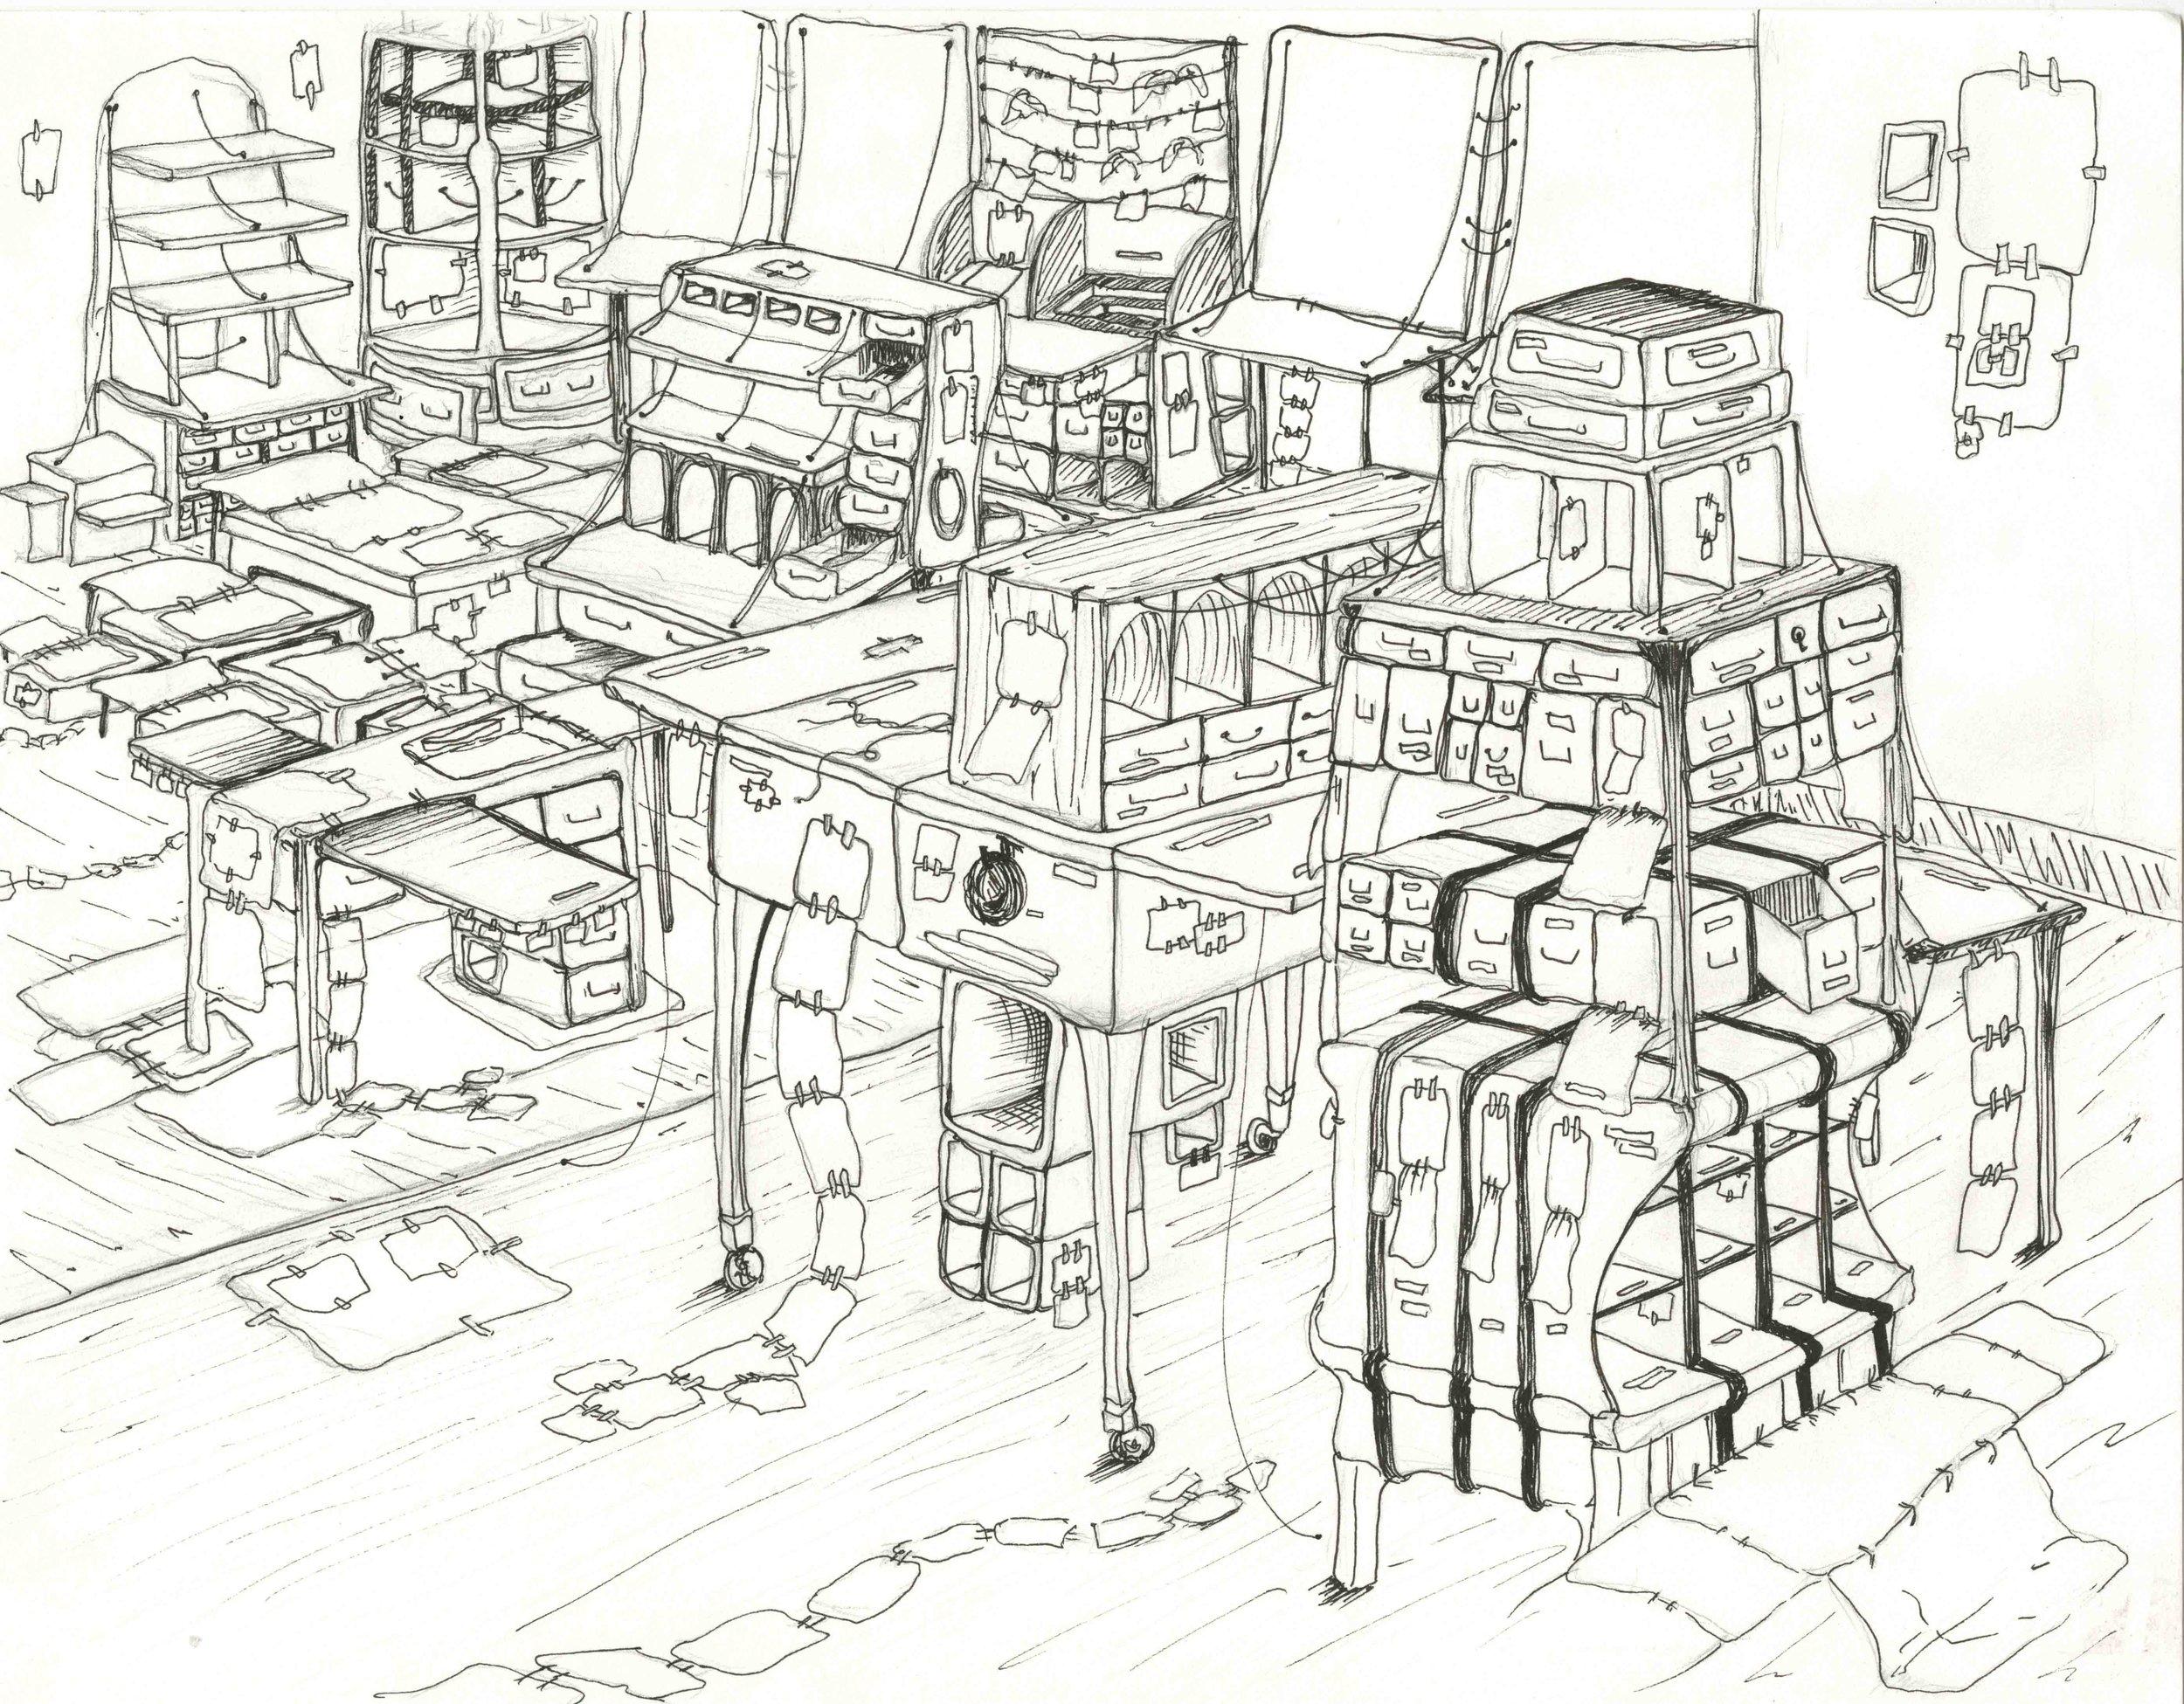 Cabinet_10_small.jpg